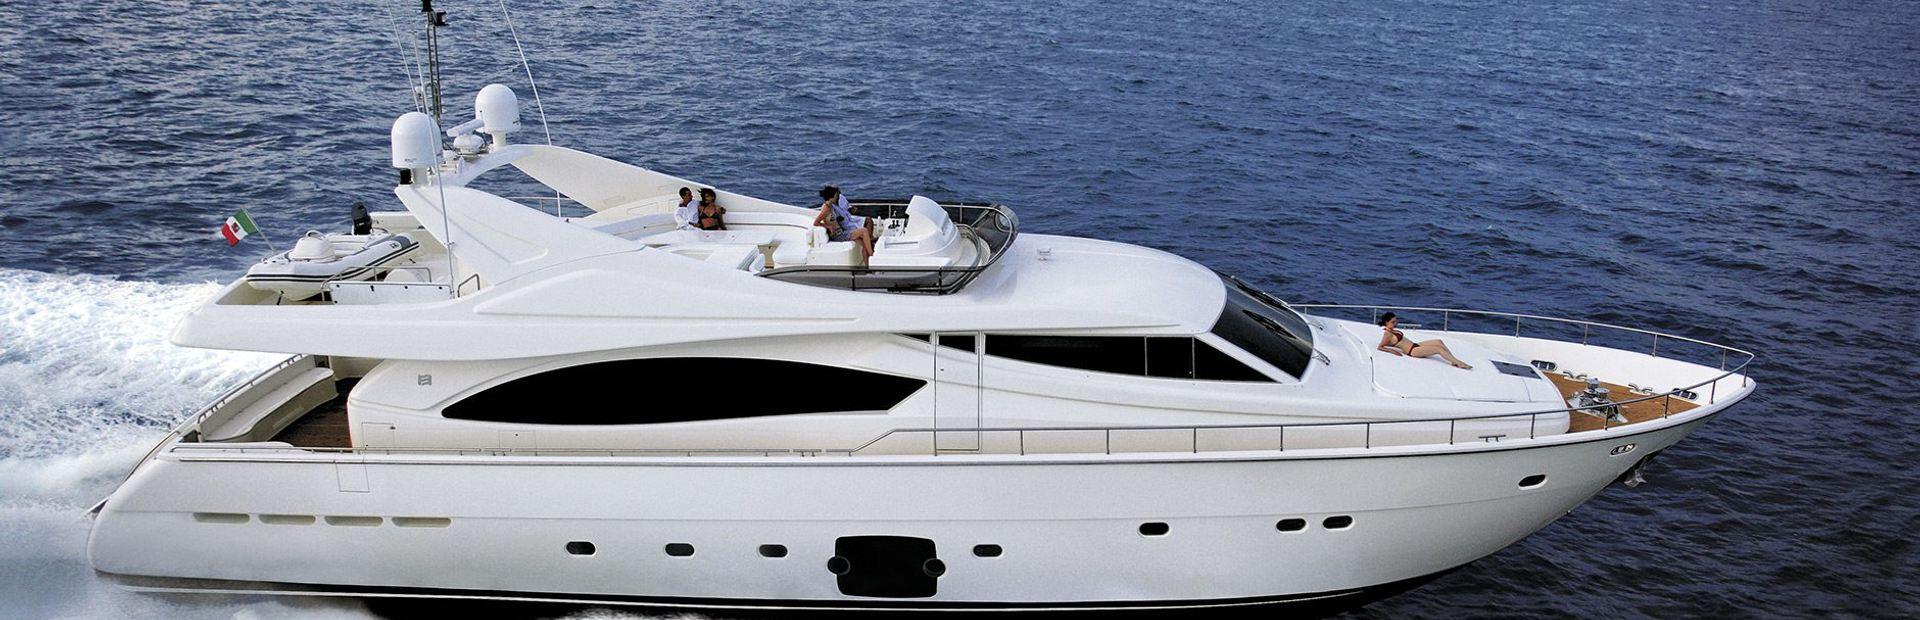 Ferretti Yachts 881 Yacht Charter